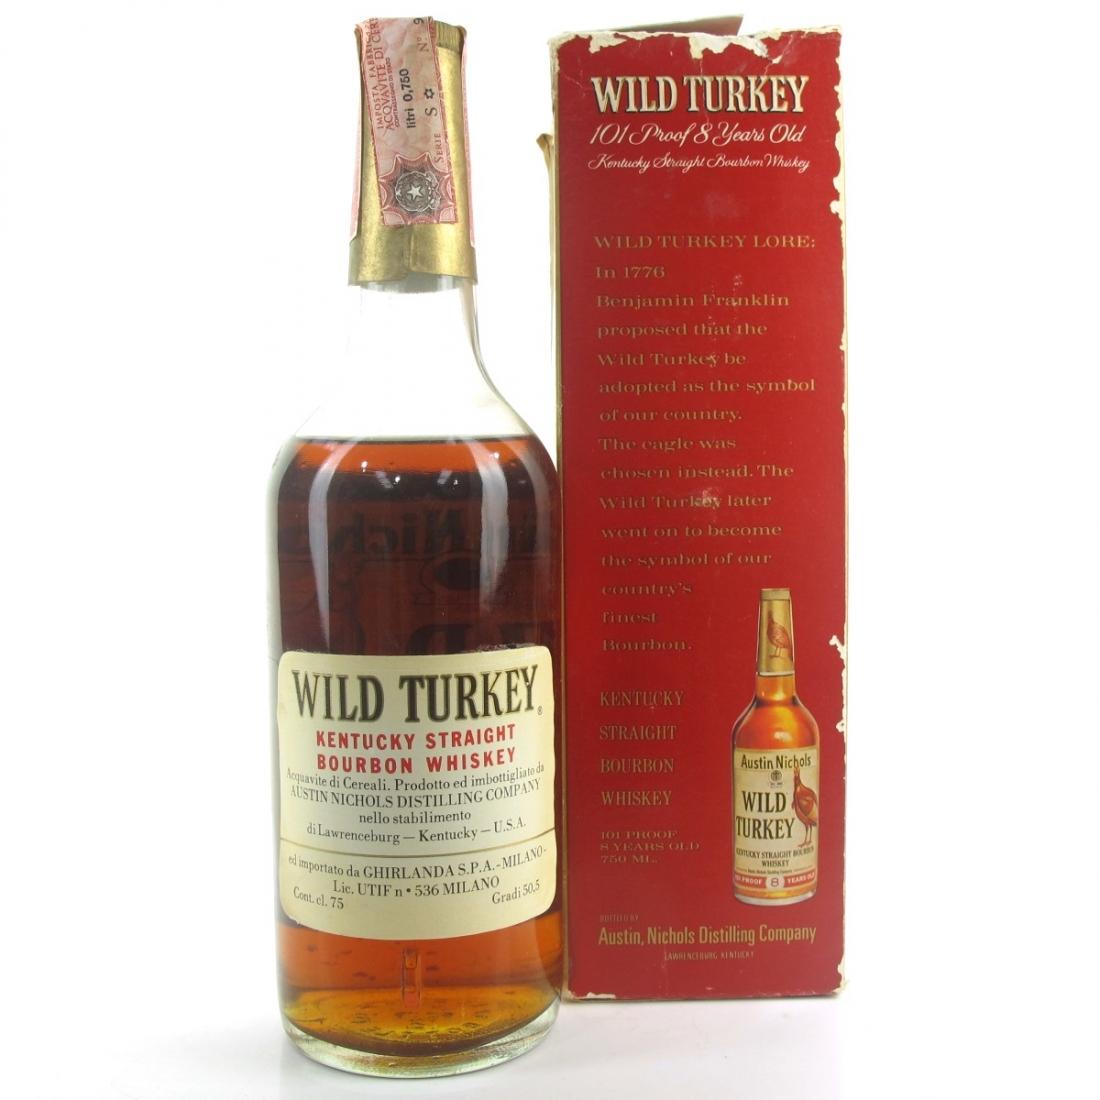 Wild Turkey 8 Year Old 101 Proof 1978